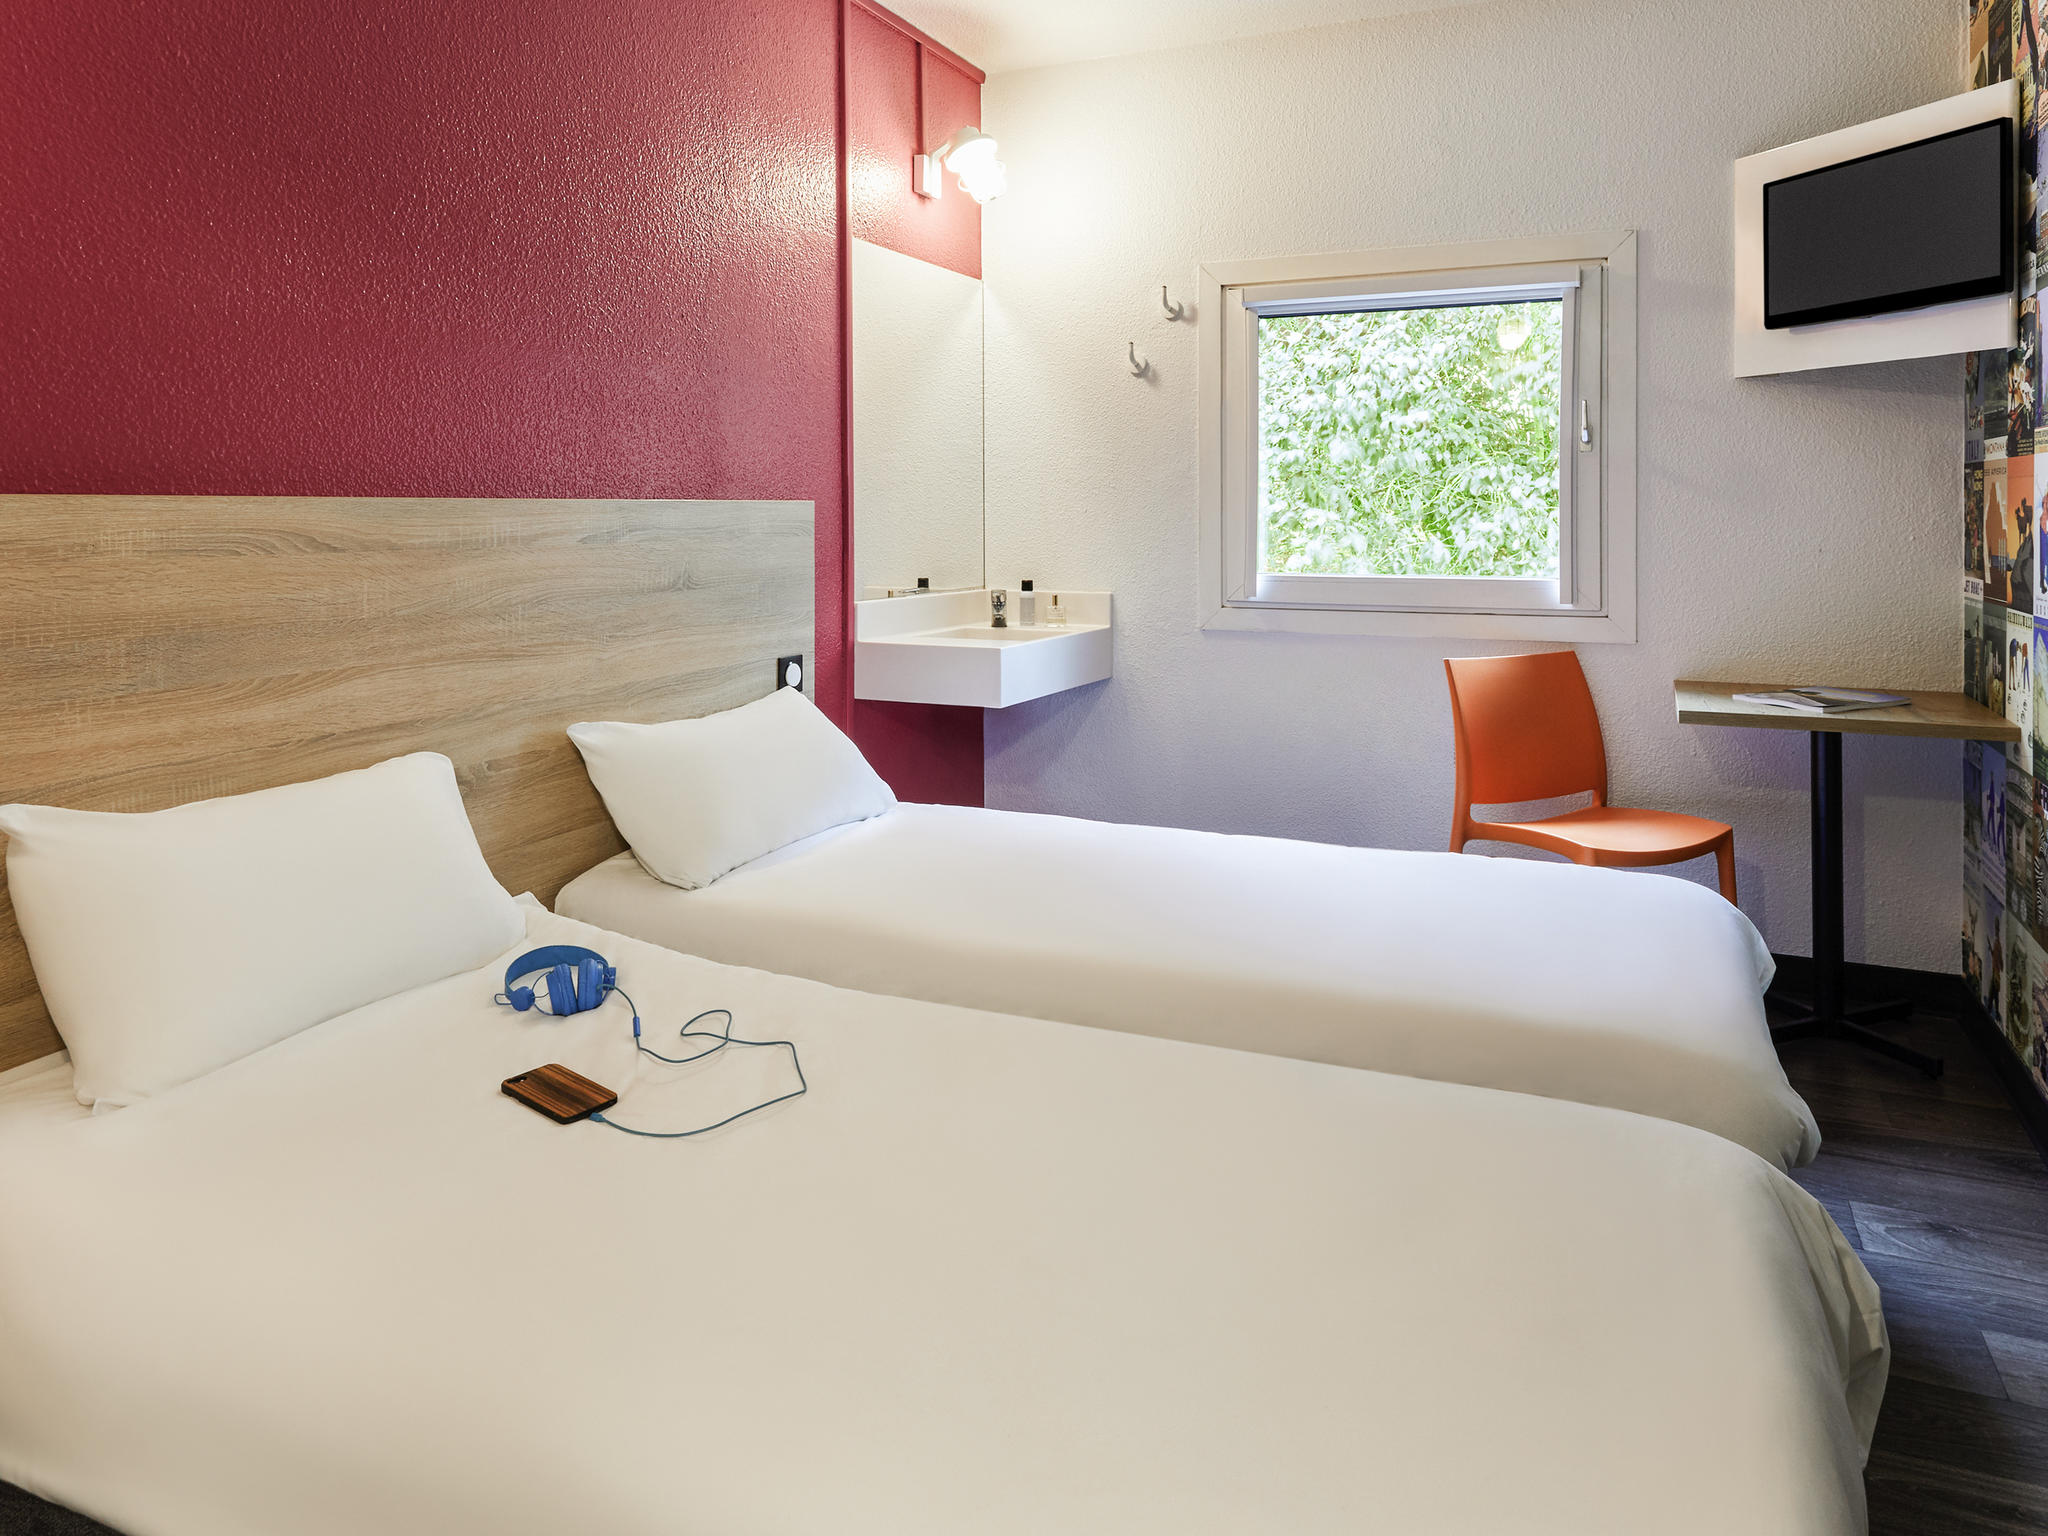 Hôtel - hotelF1 Rungis Orly (rénové)